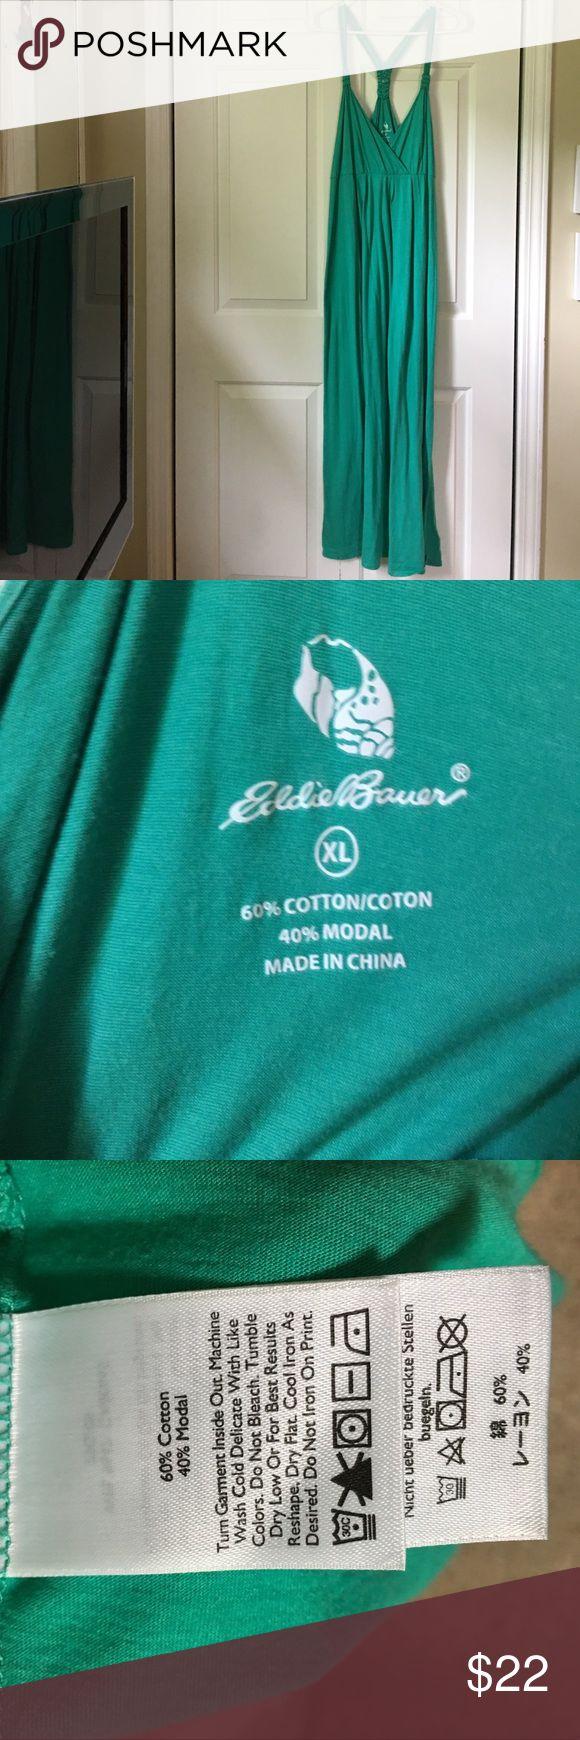 Eddie Bauer cotton/modal maxi dress sz XL Beautiful color teal size XL Eddie Bauer halter maxi dress.  Worn once.  Perfect condition. Beach time!!! Eddie Bauer Dresses Maxi